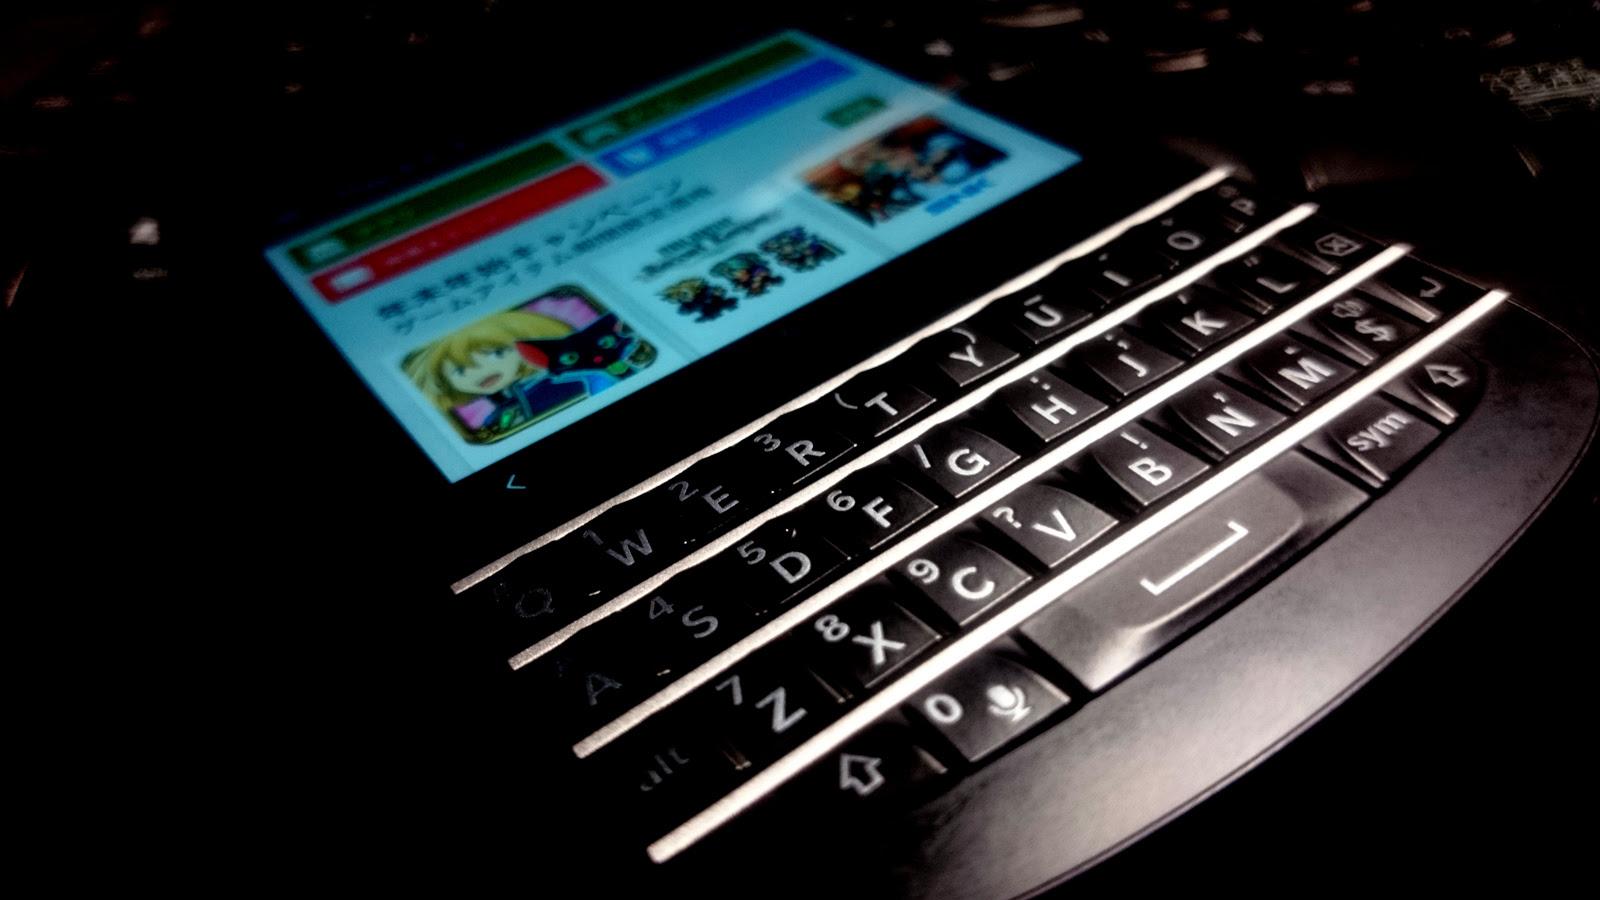 Opera Mini For Blackberry Q10 Apk : TÉLÉCHARGER OPERA MINI ...